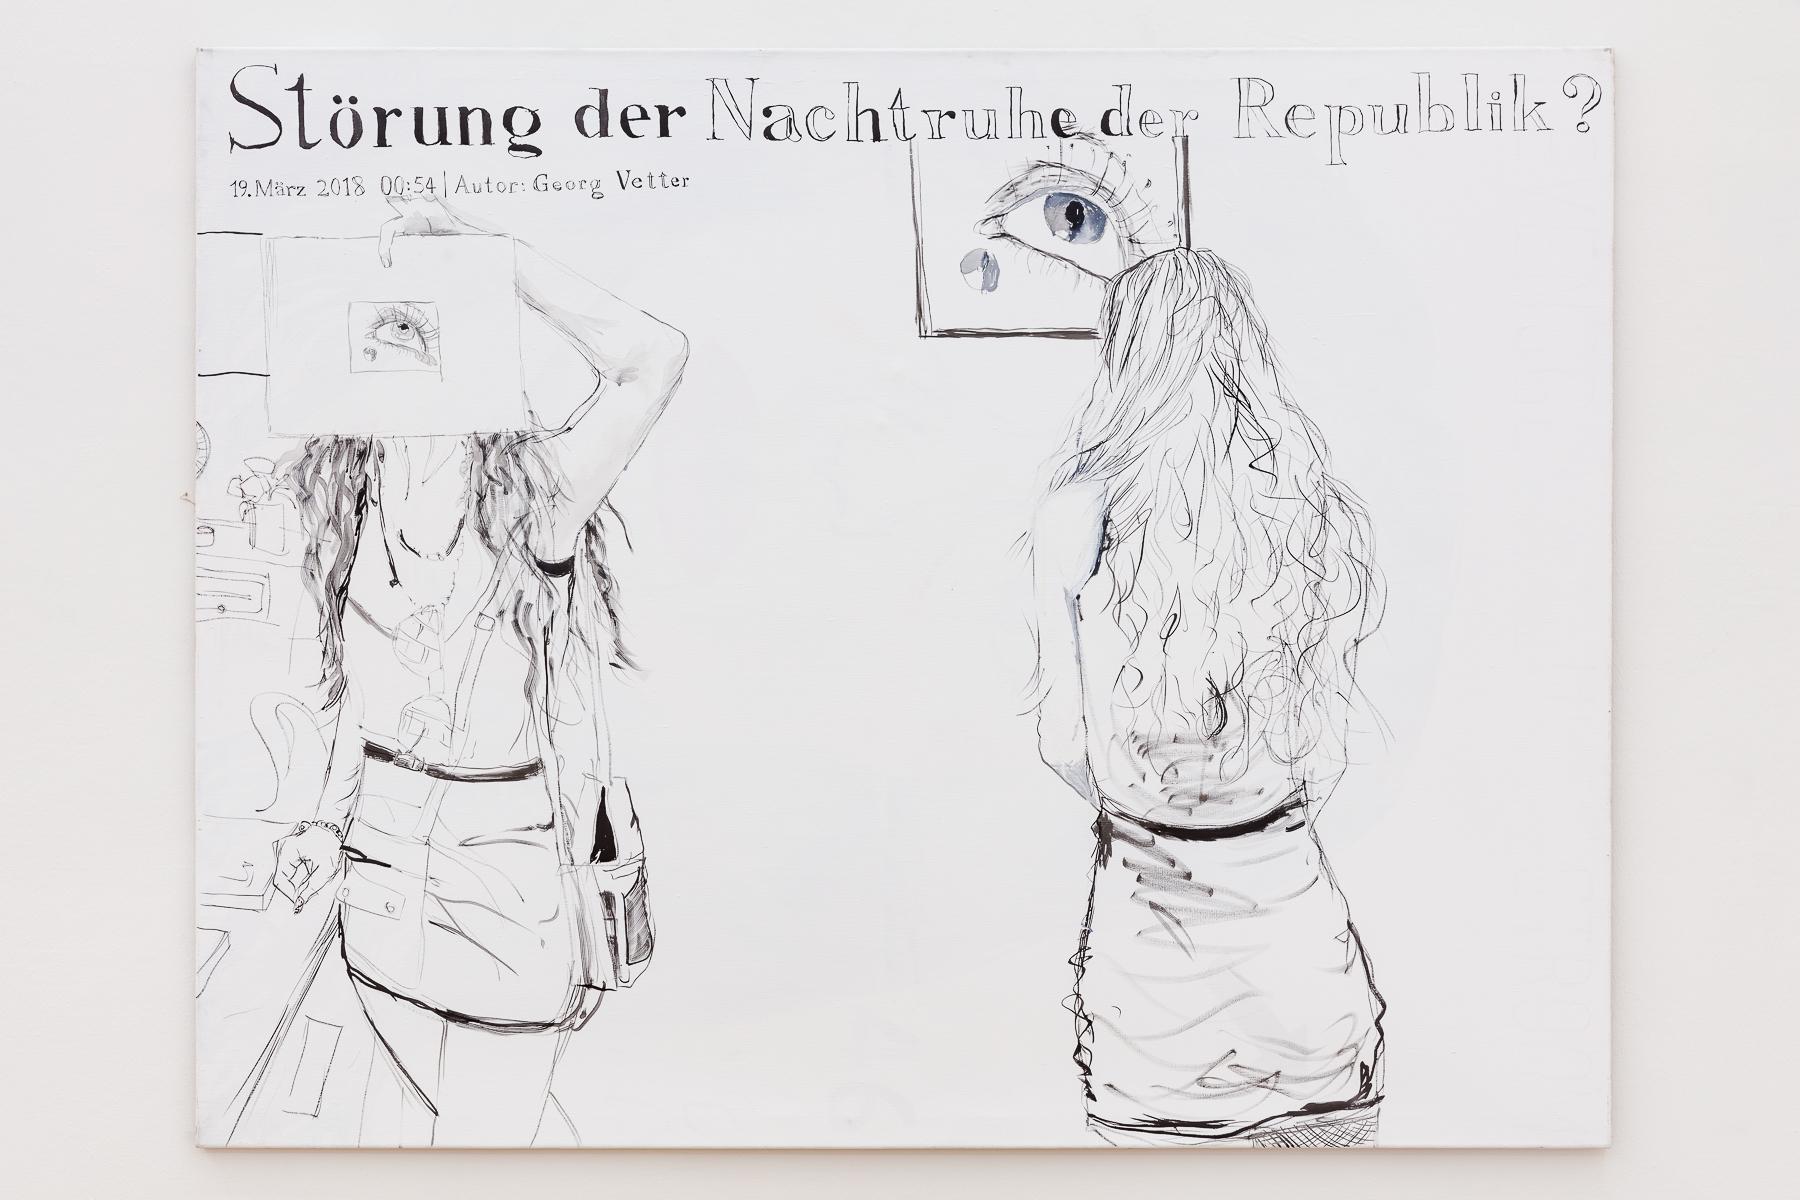 2019_05_20_Elke-Krystufek_Croy-Nielsen_by-kunst-dokumentation-com_058_web.jpg